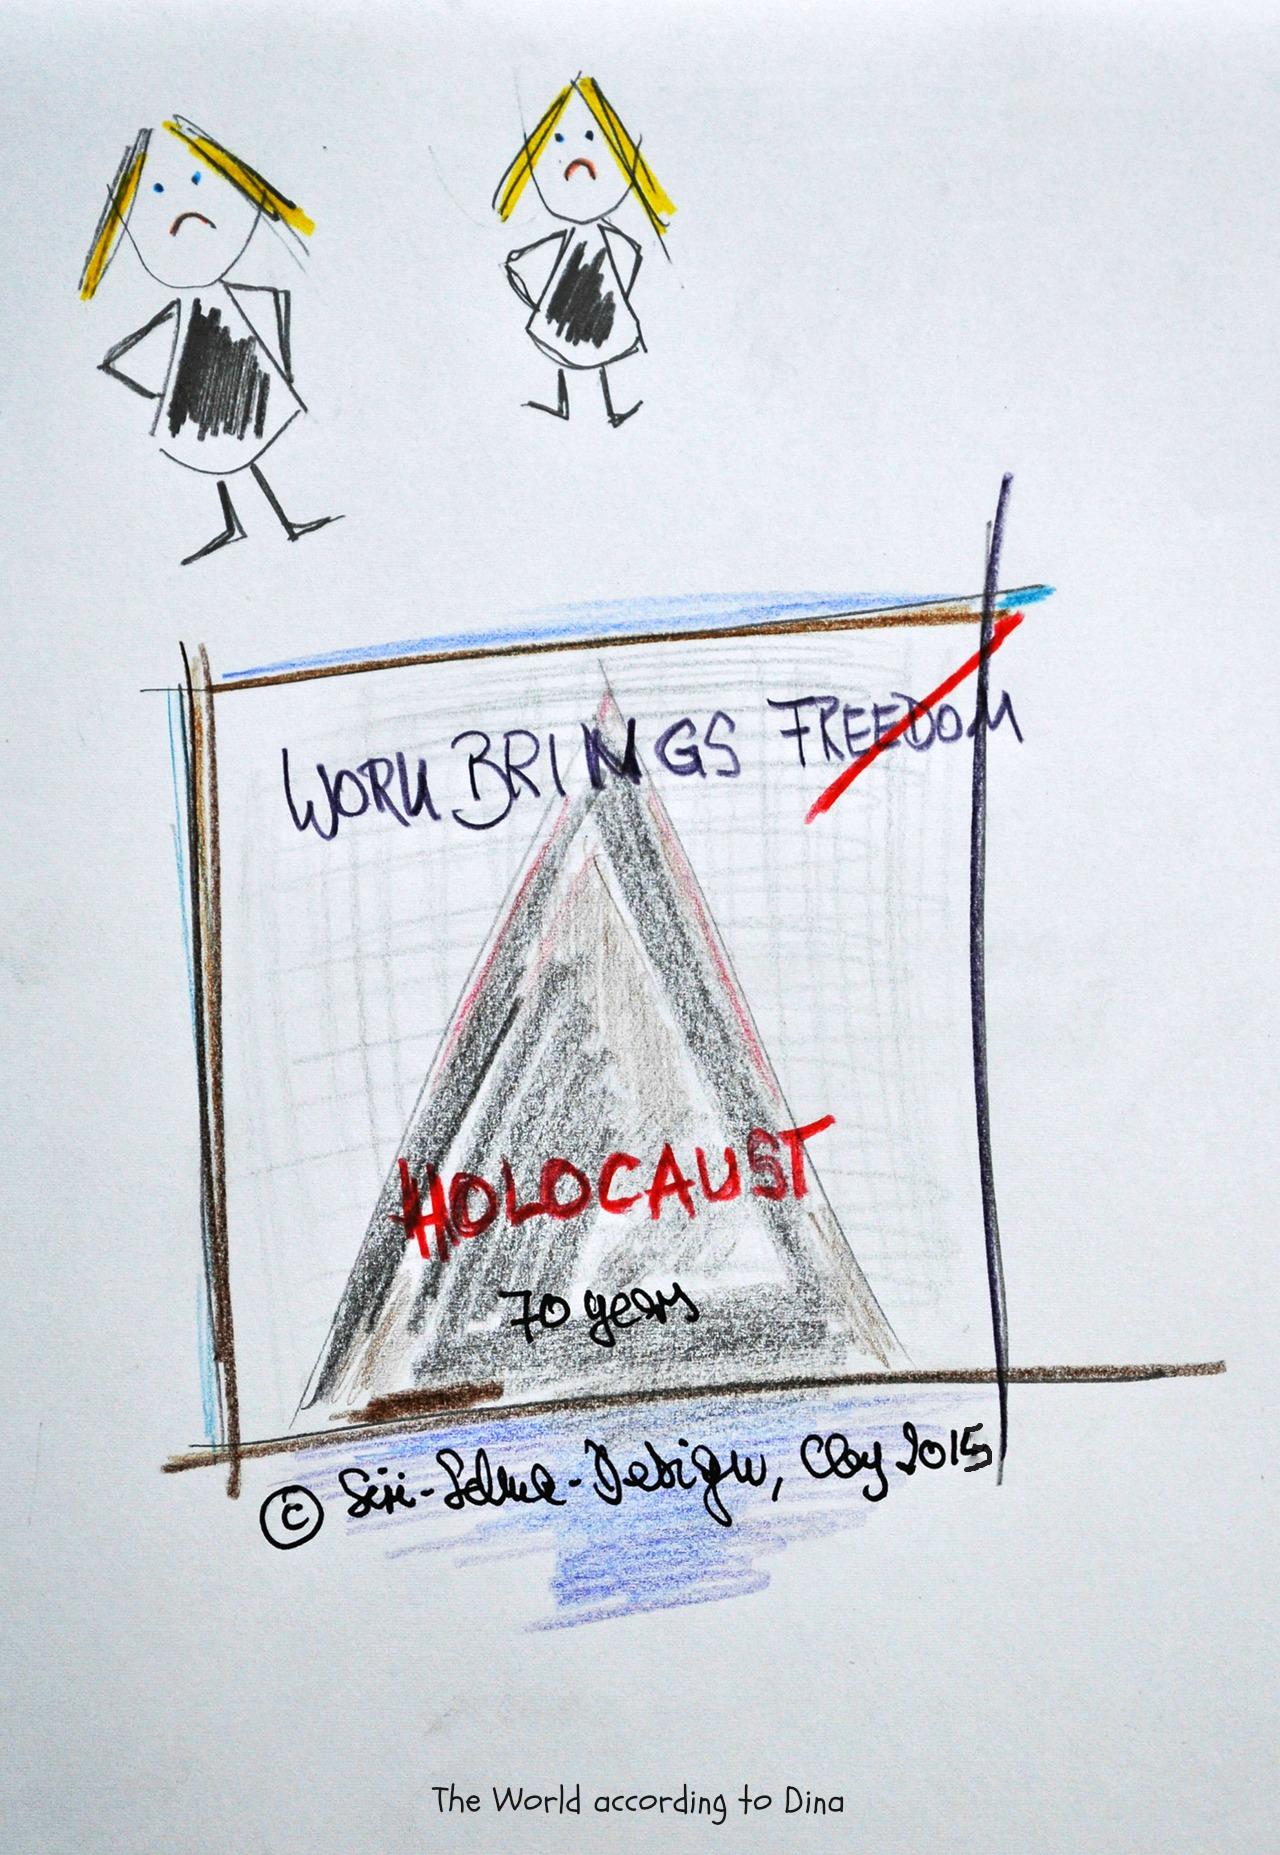 SS_Holocaust15_klein